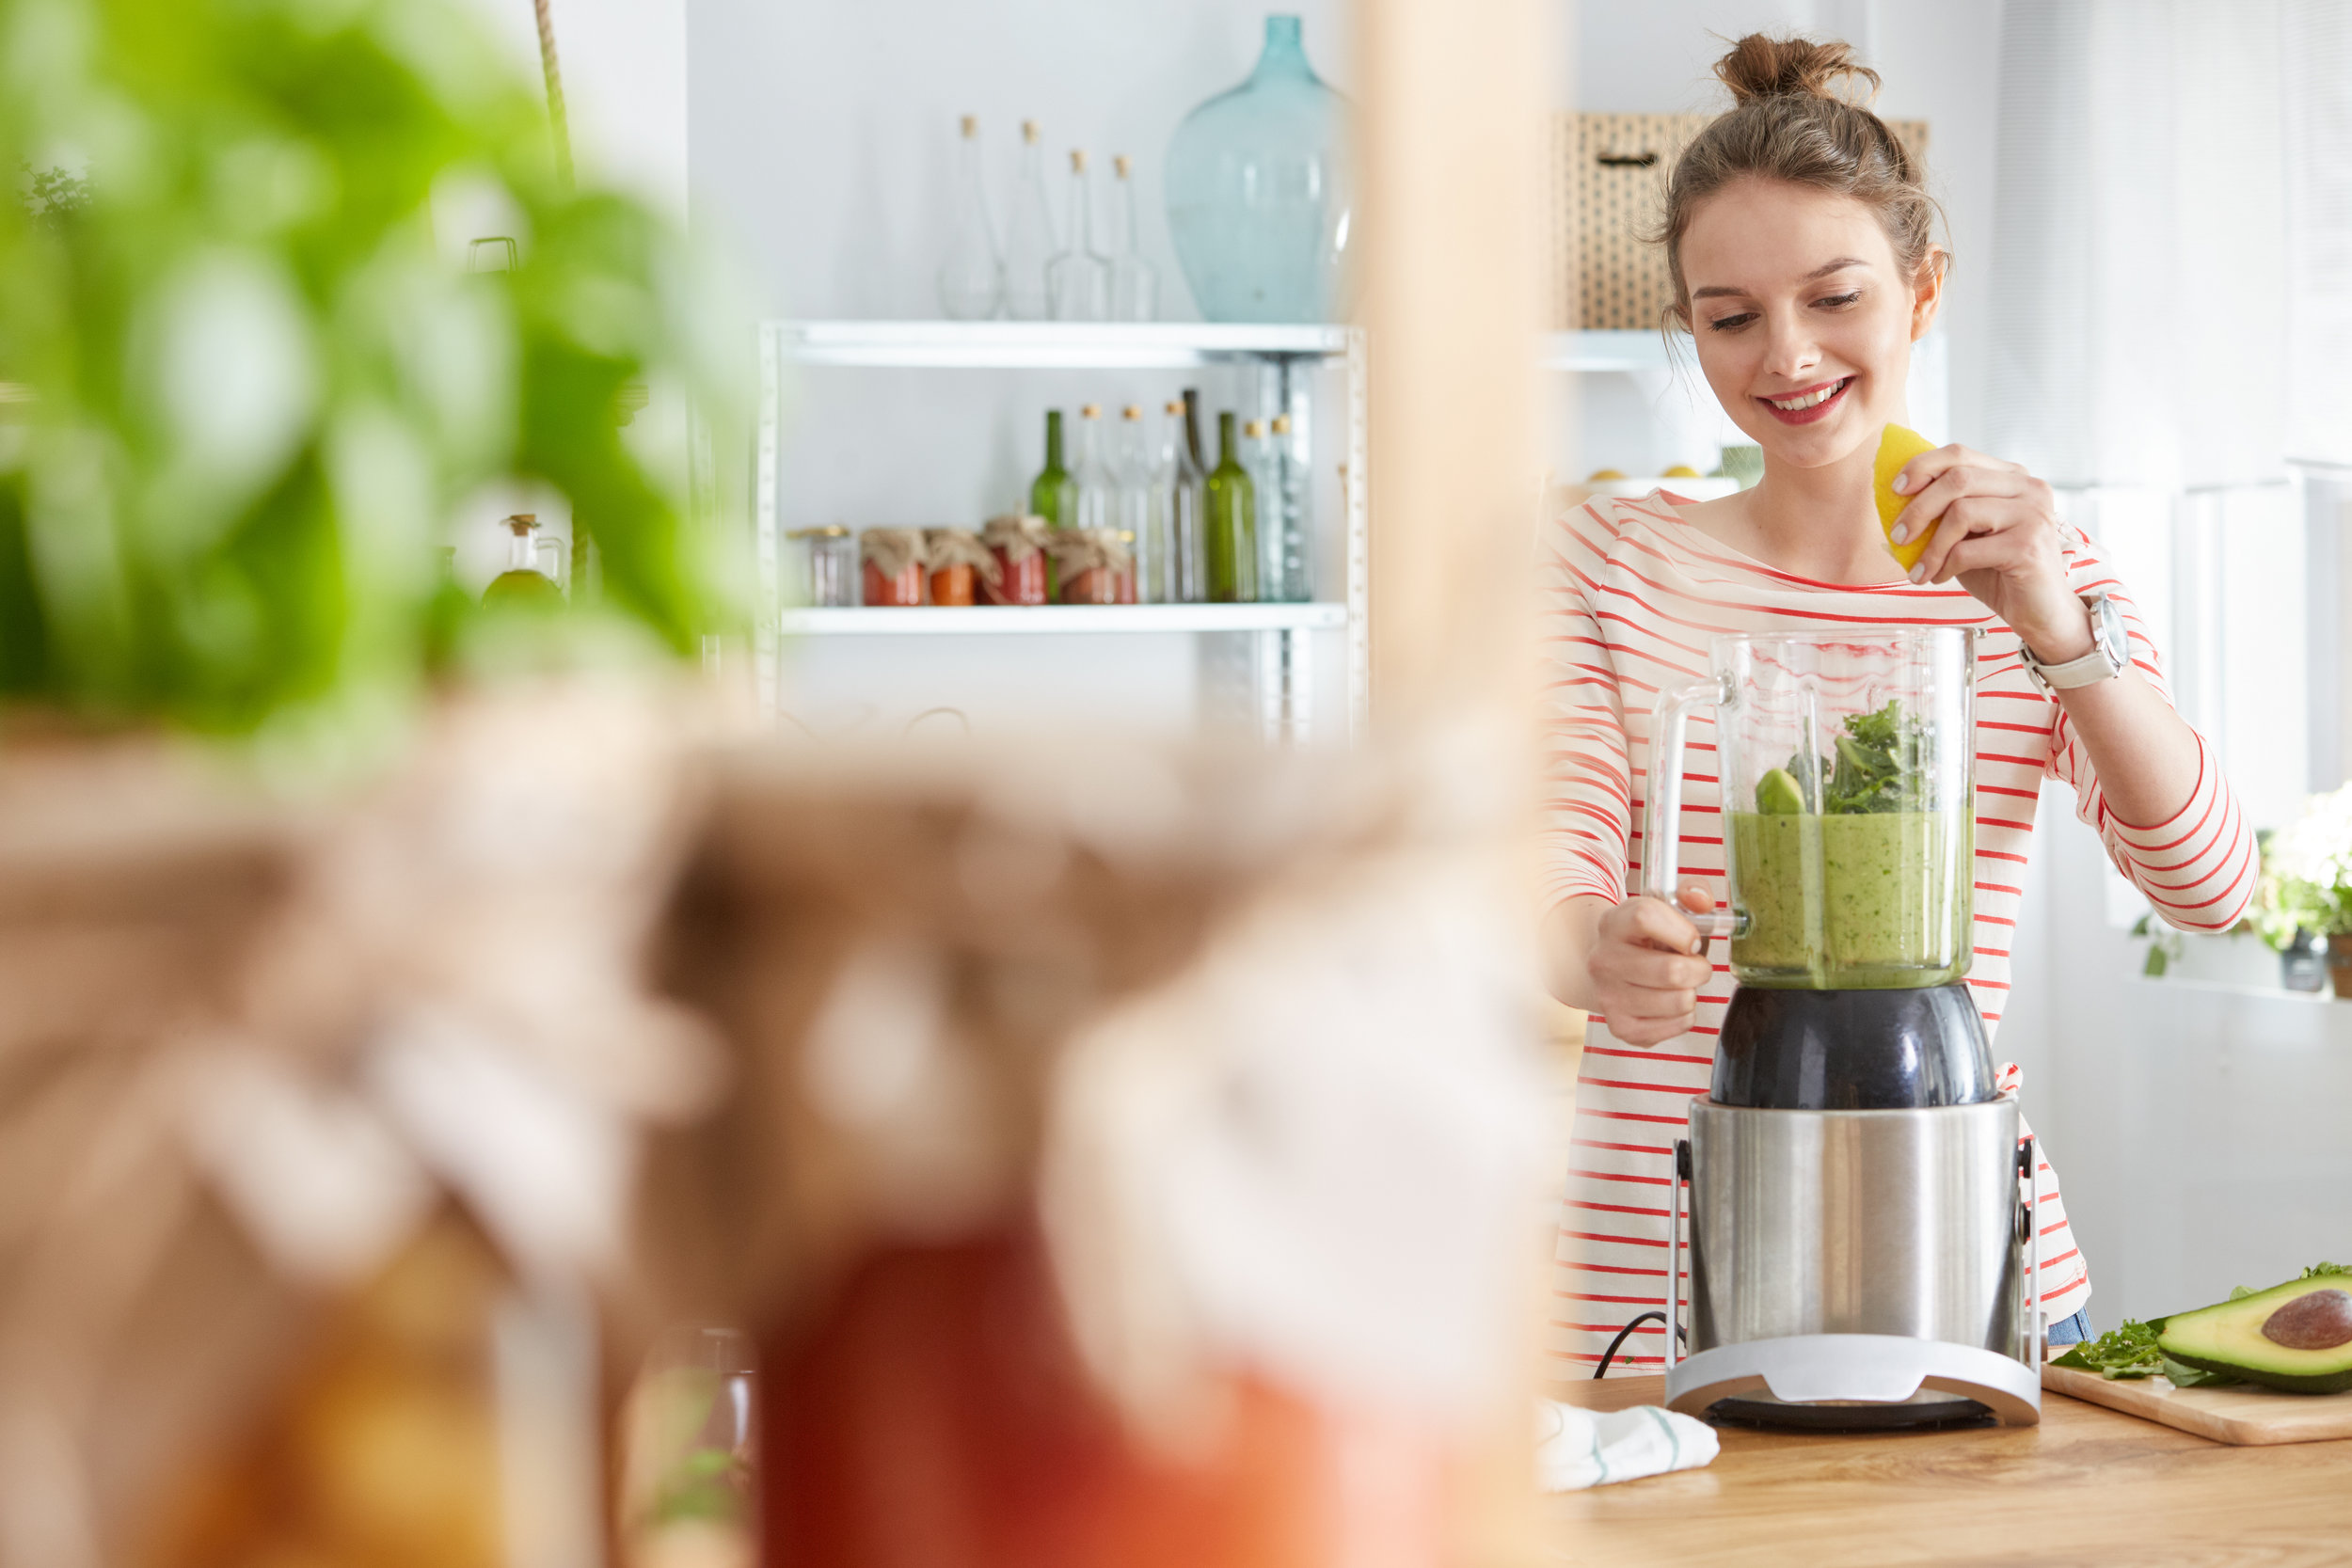 woman-making-vegetable-smoothie-PR7U4MU.jpg